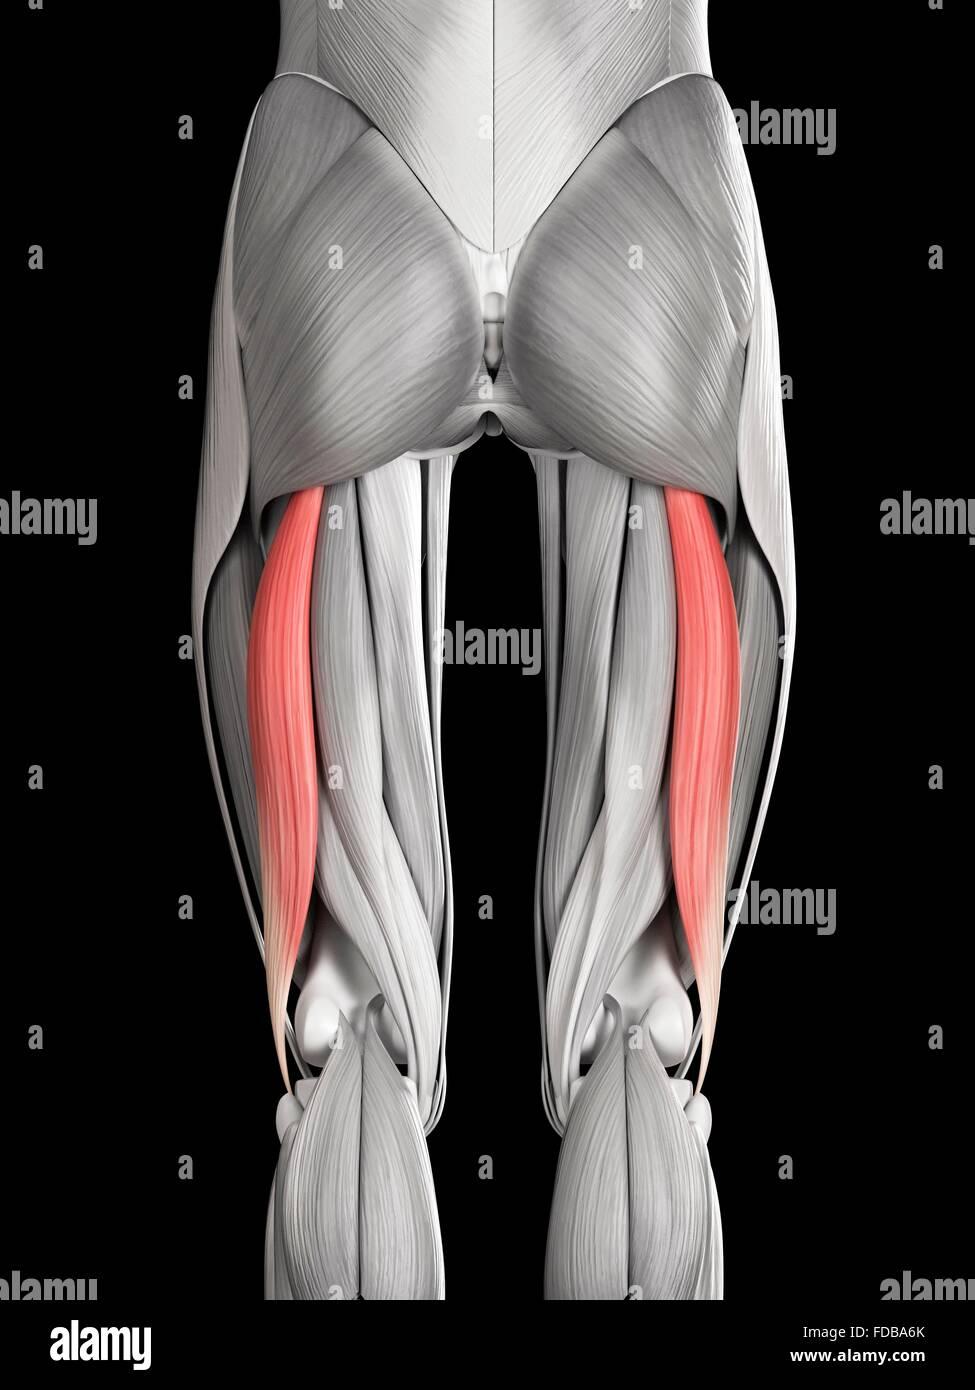 how to build biceps femoris